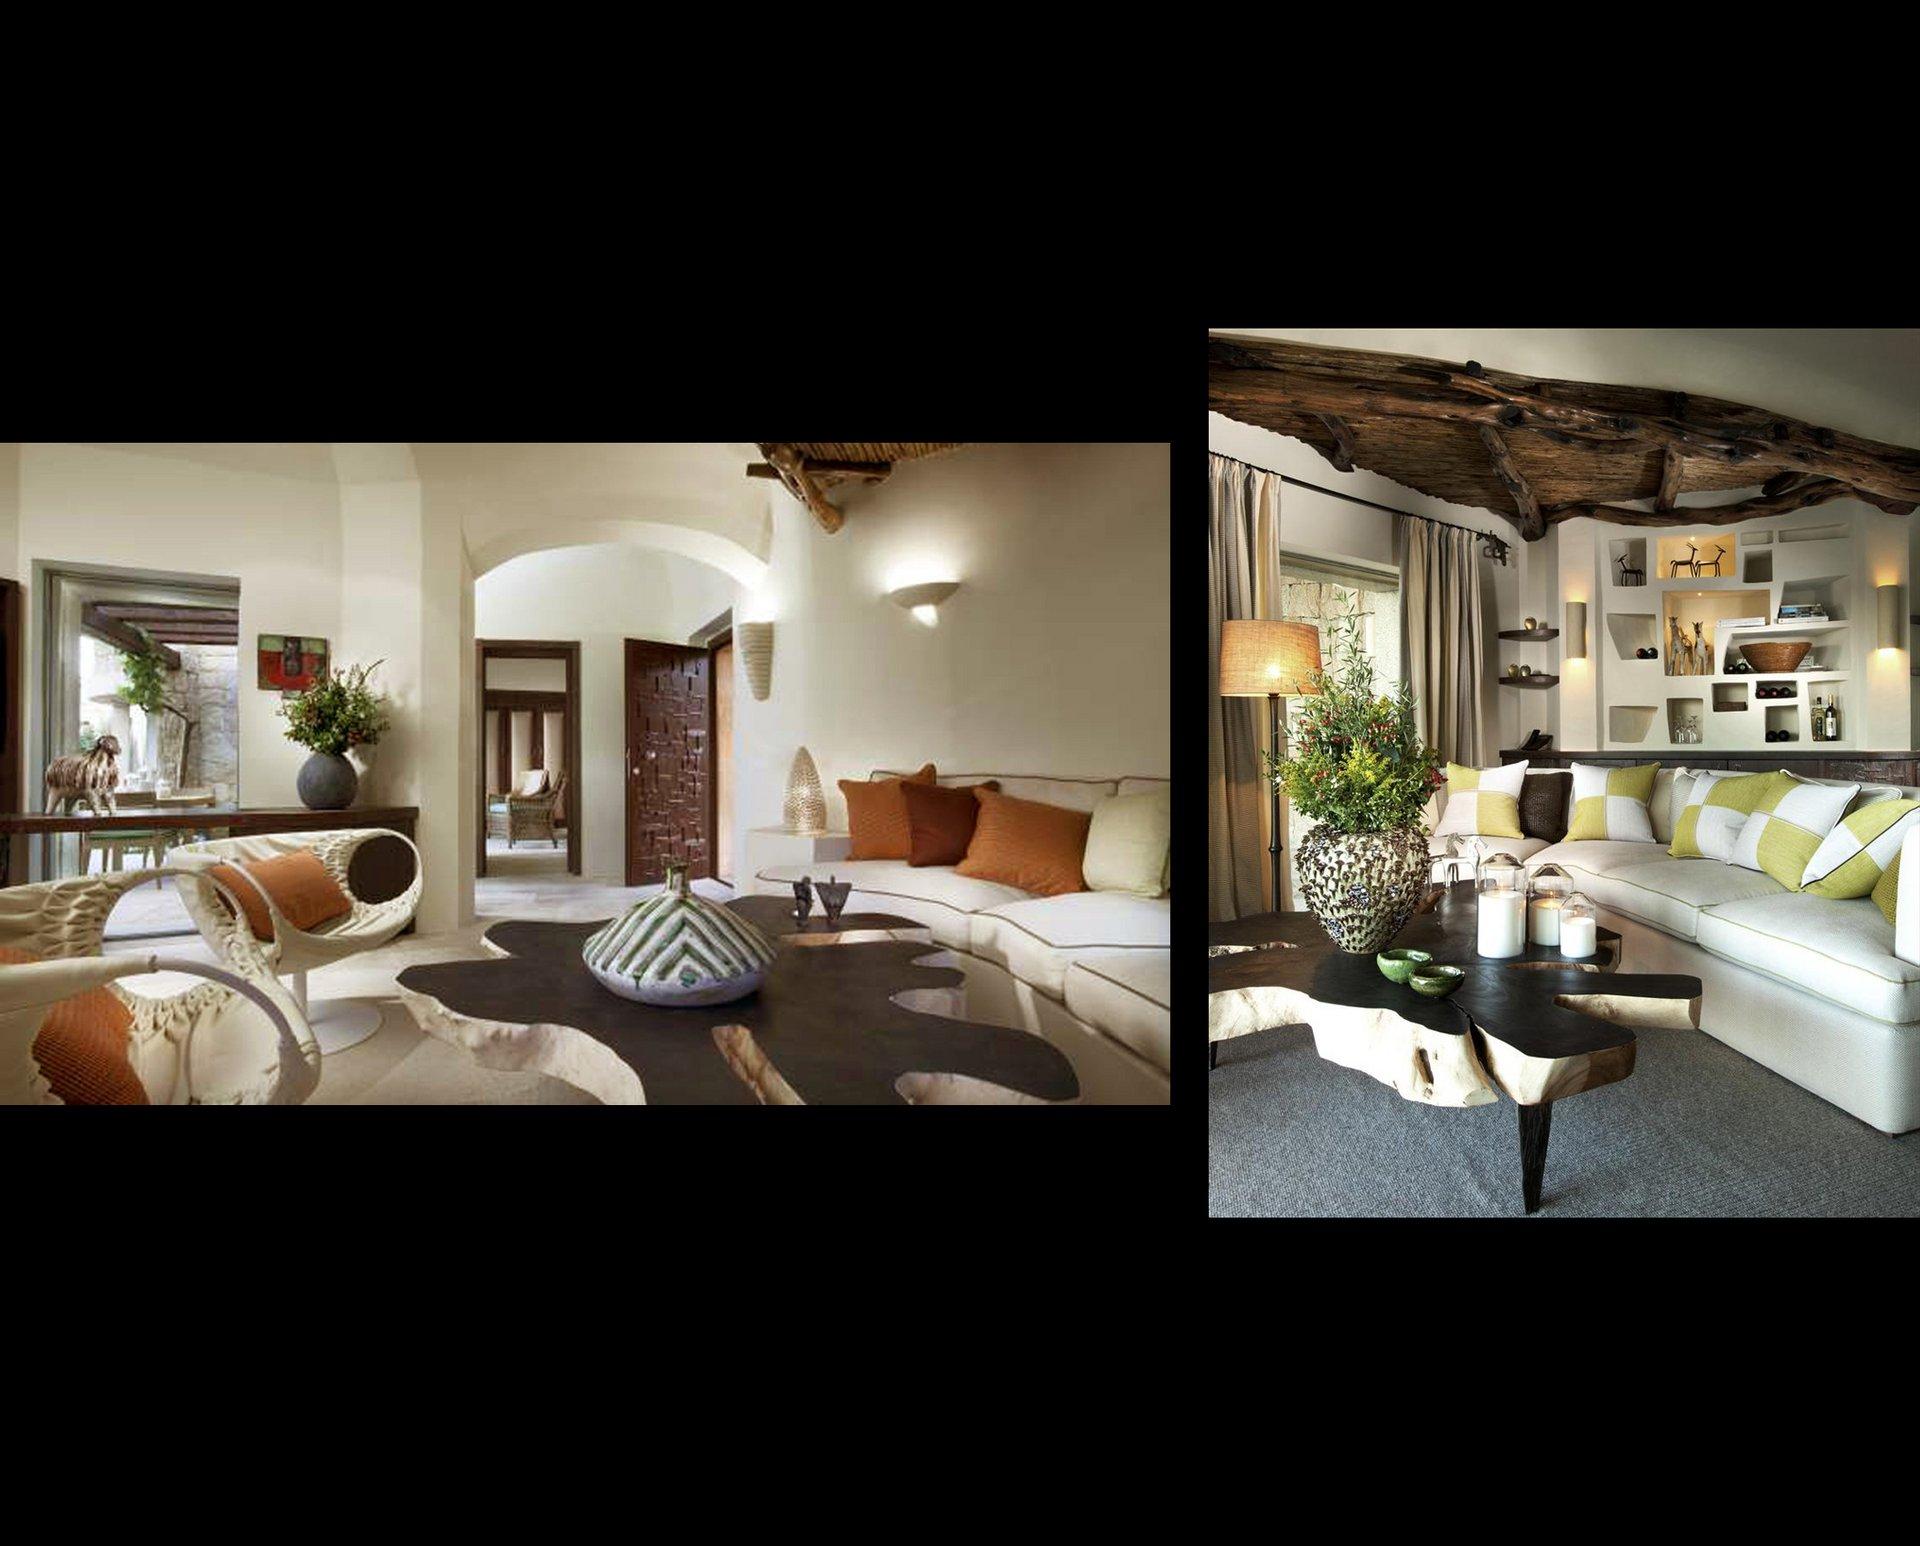 Innenarchitekt Interior Design Hotel Hotellerie Restaurant Retail: beautiful resort architecture and design -  best combination of design, nature and luxury